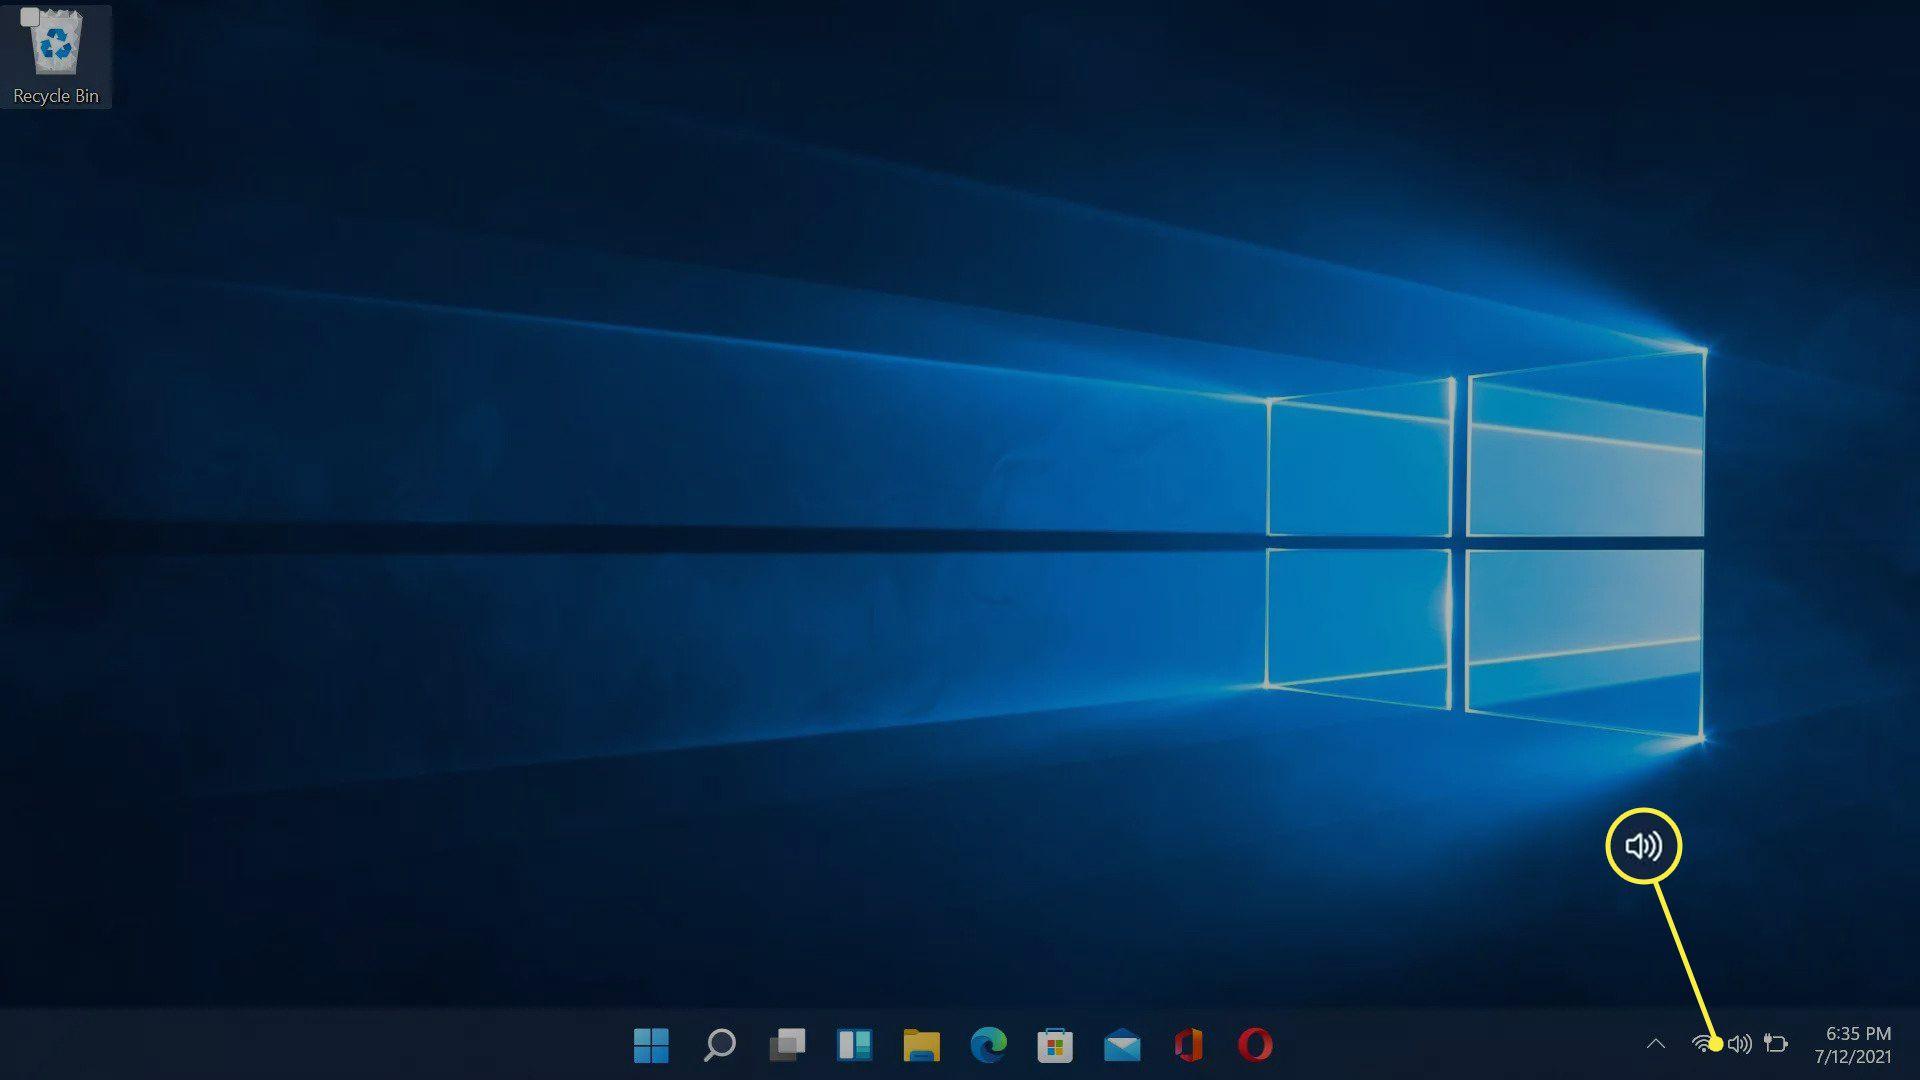 The speaker icon highlighted on the Windows 11 taskbar